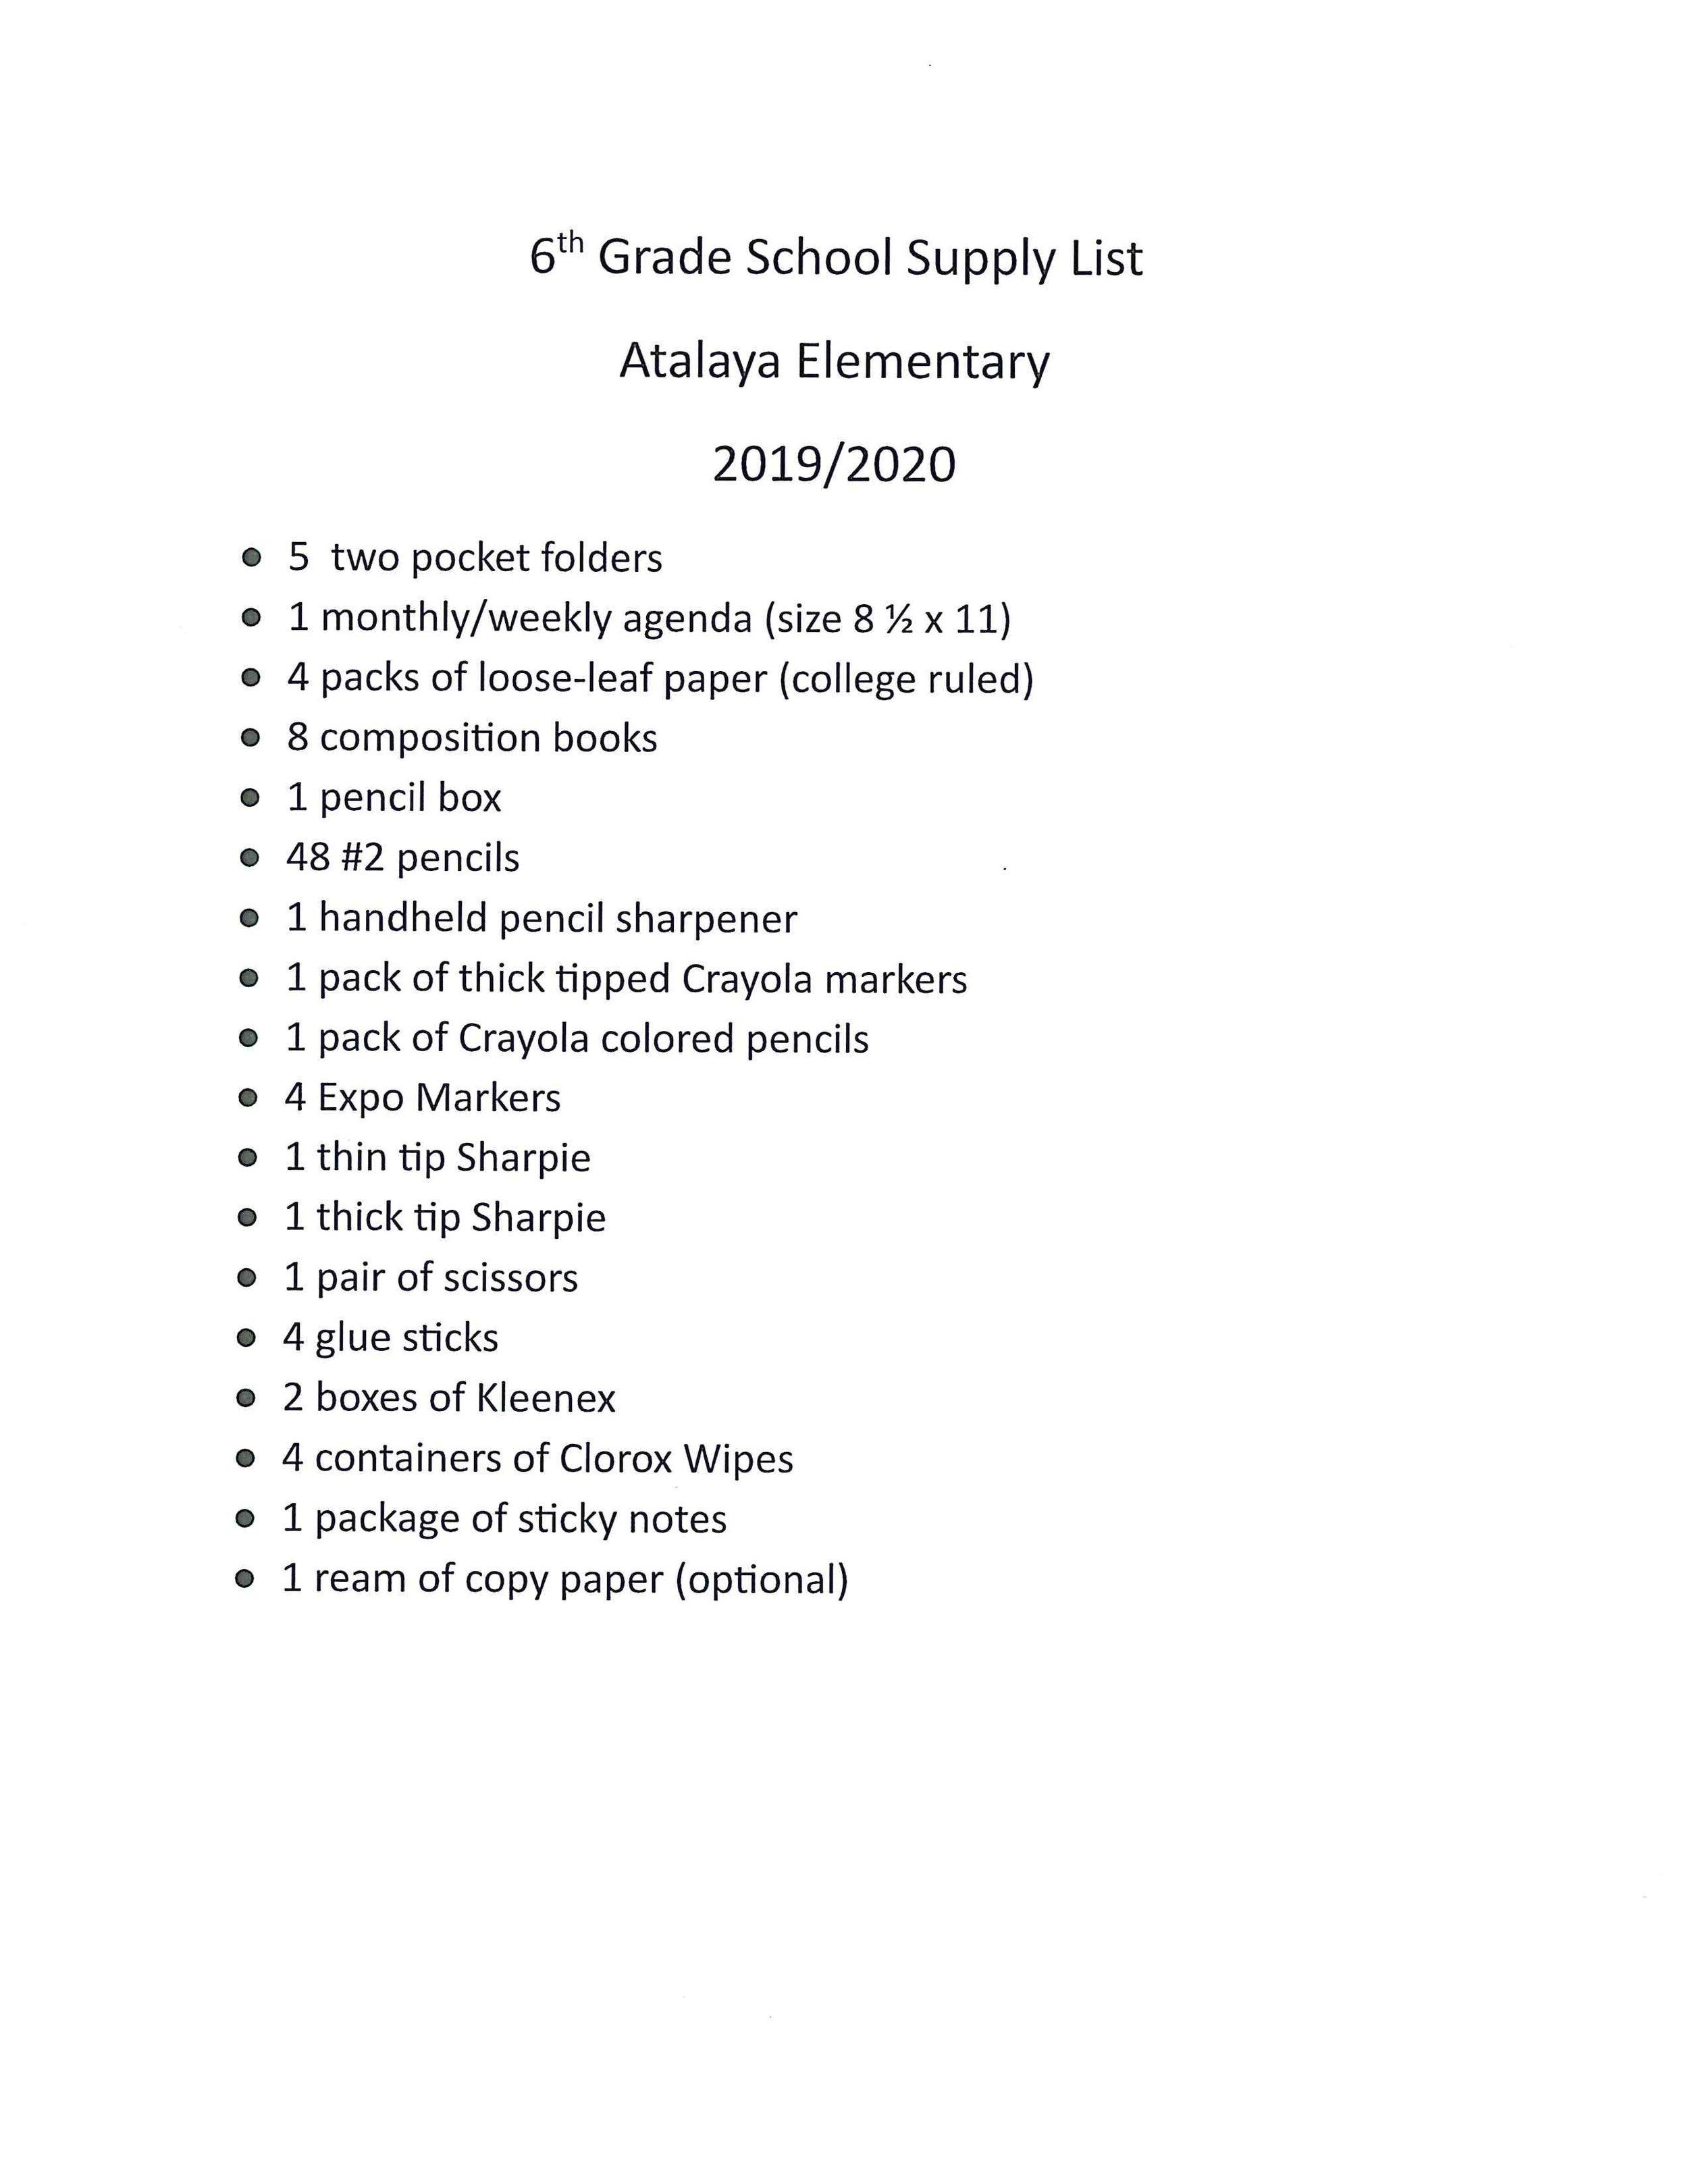 Back to School List 19_20 6th Grade.jpg